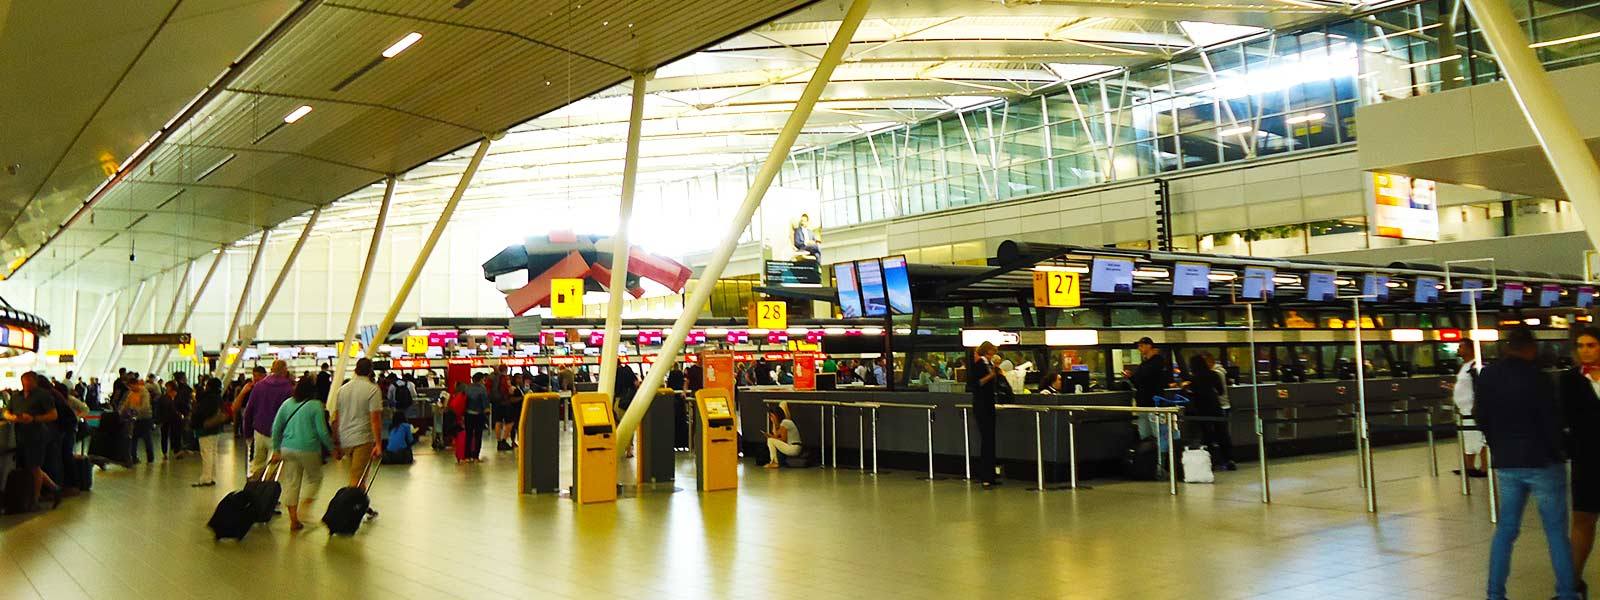 Verterk terminal 3 Schiphol